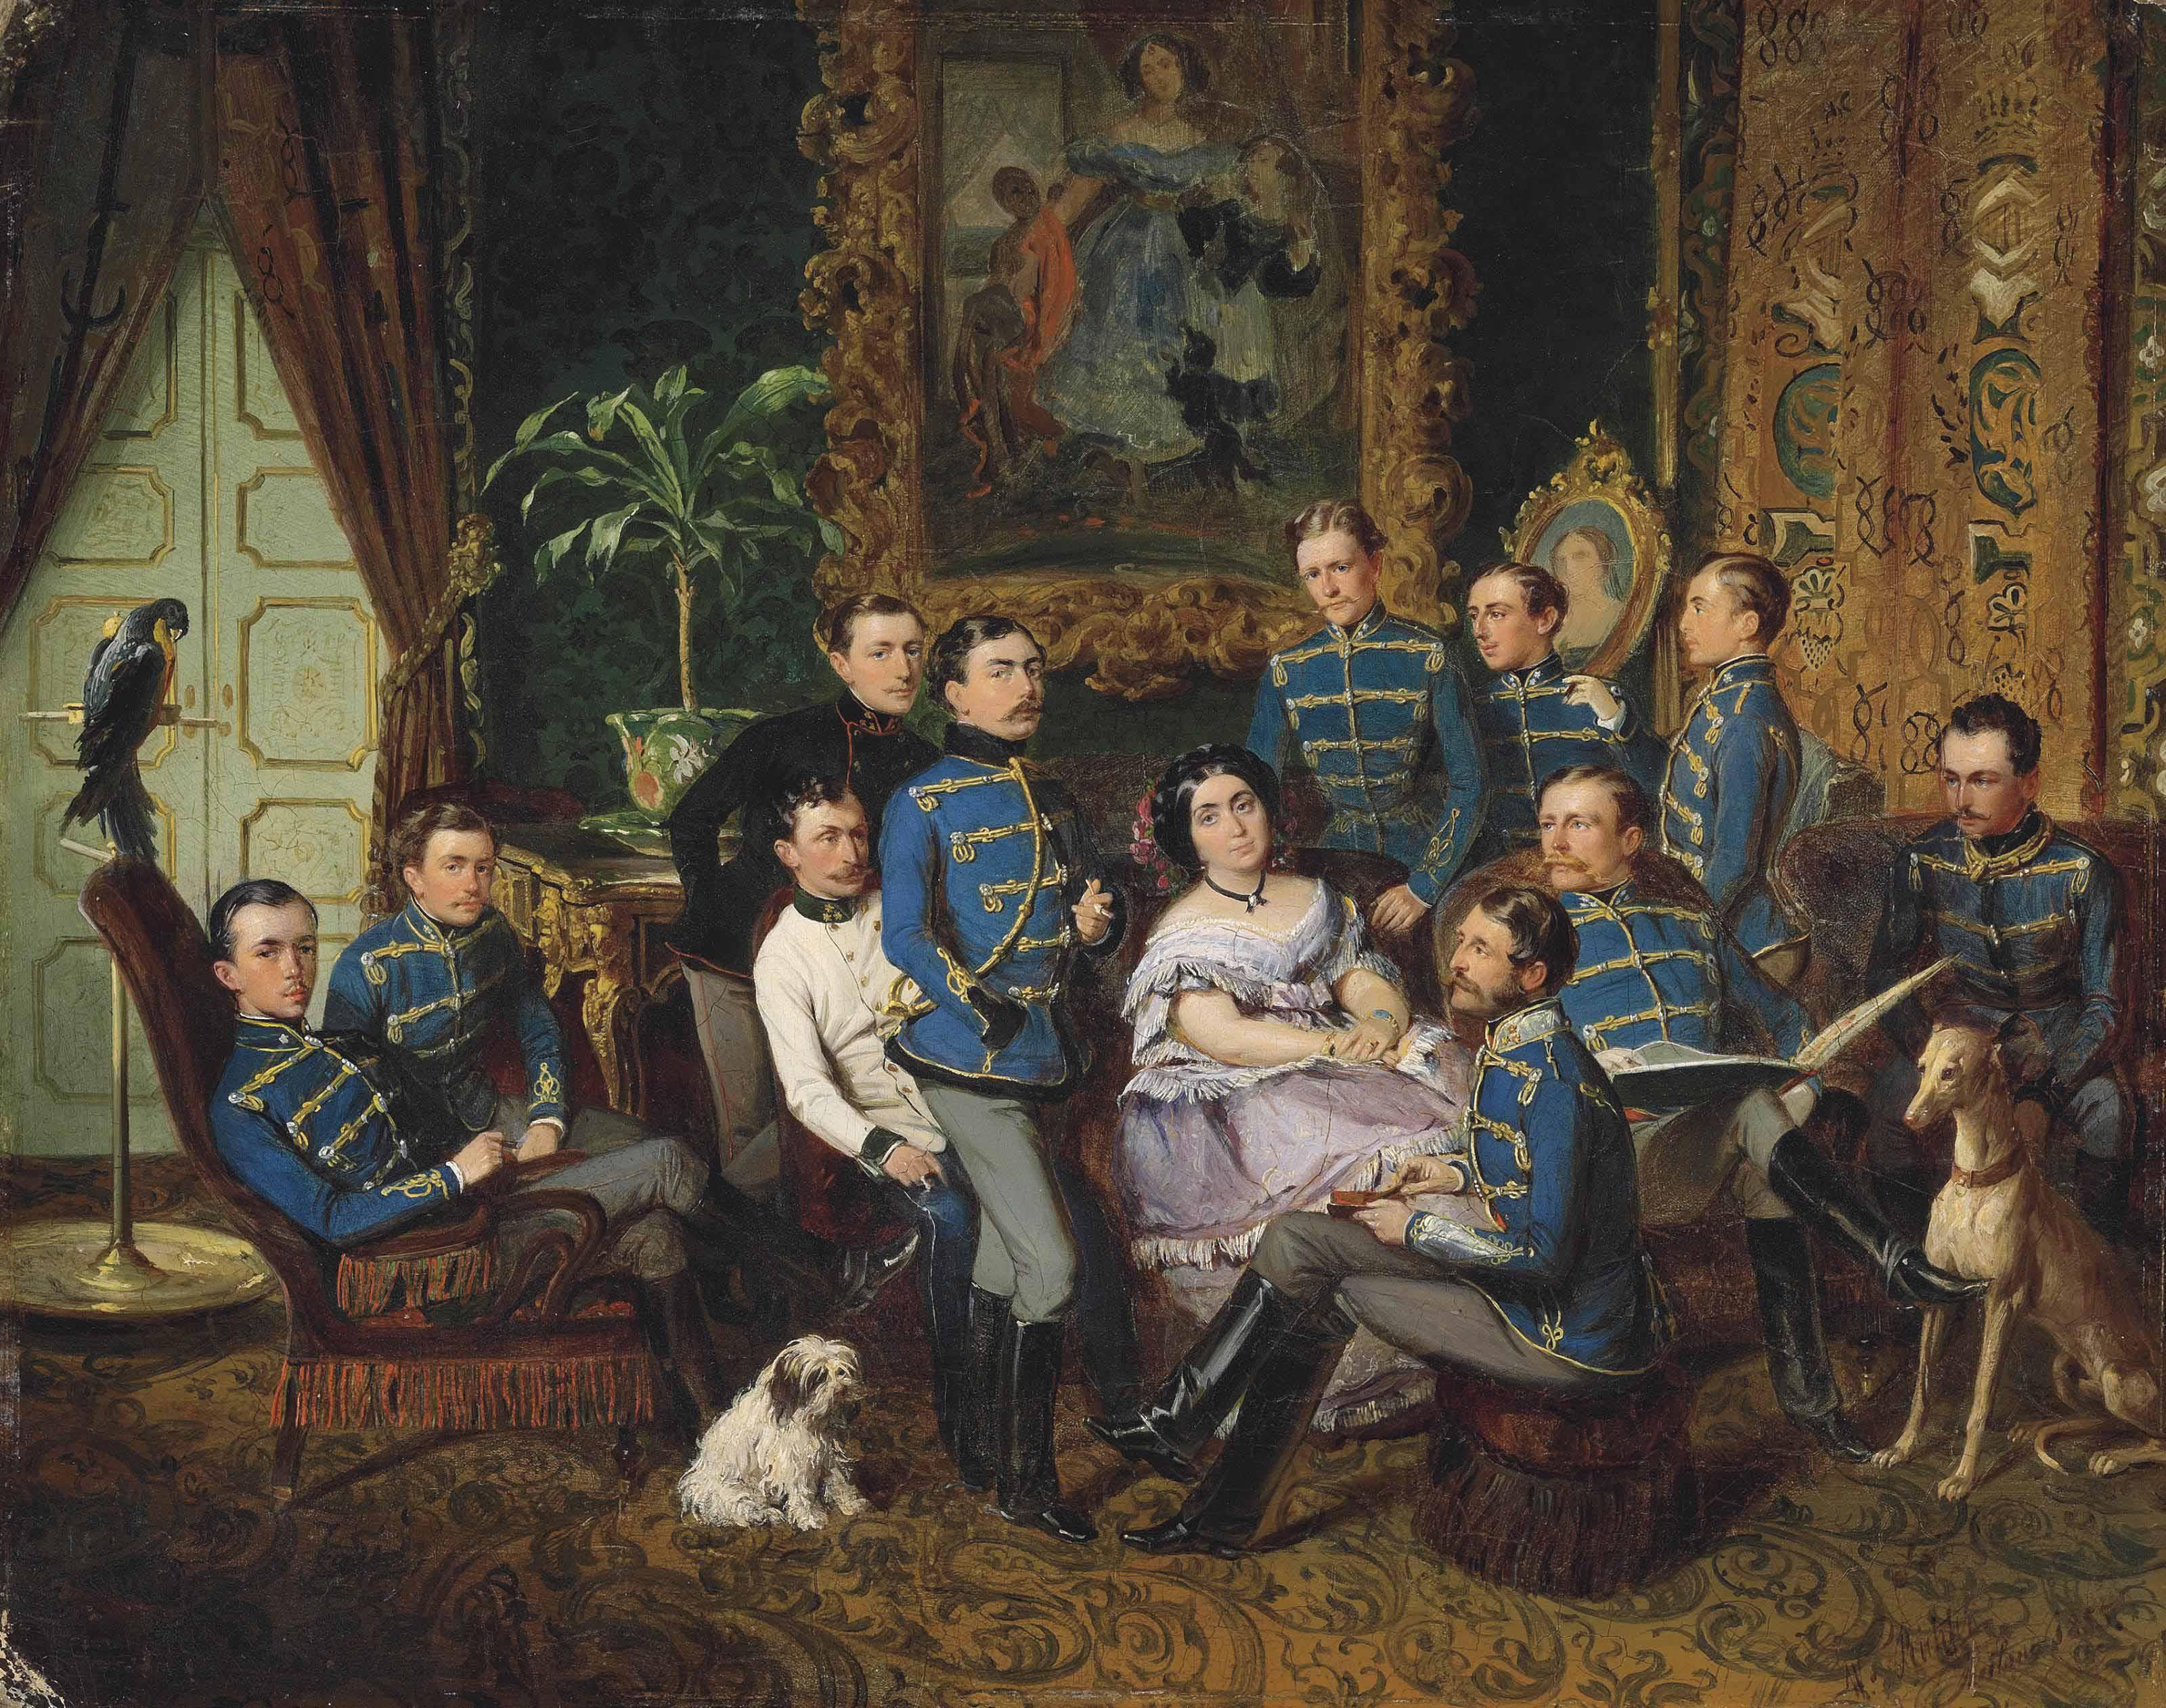 Portrait of Countess Julia Samoilova (1803-1875) with Austrian Hussars